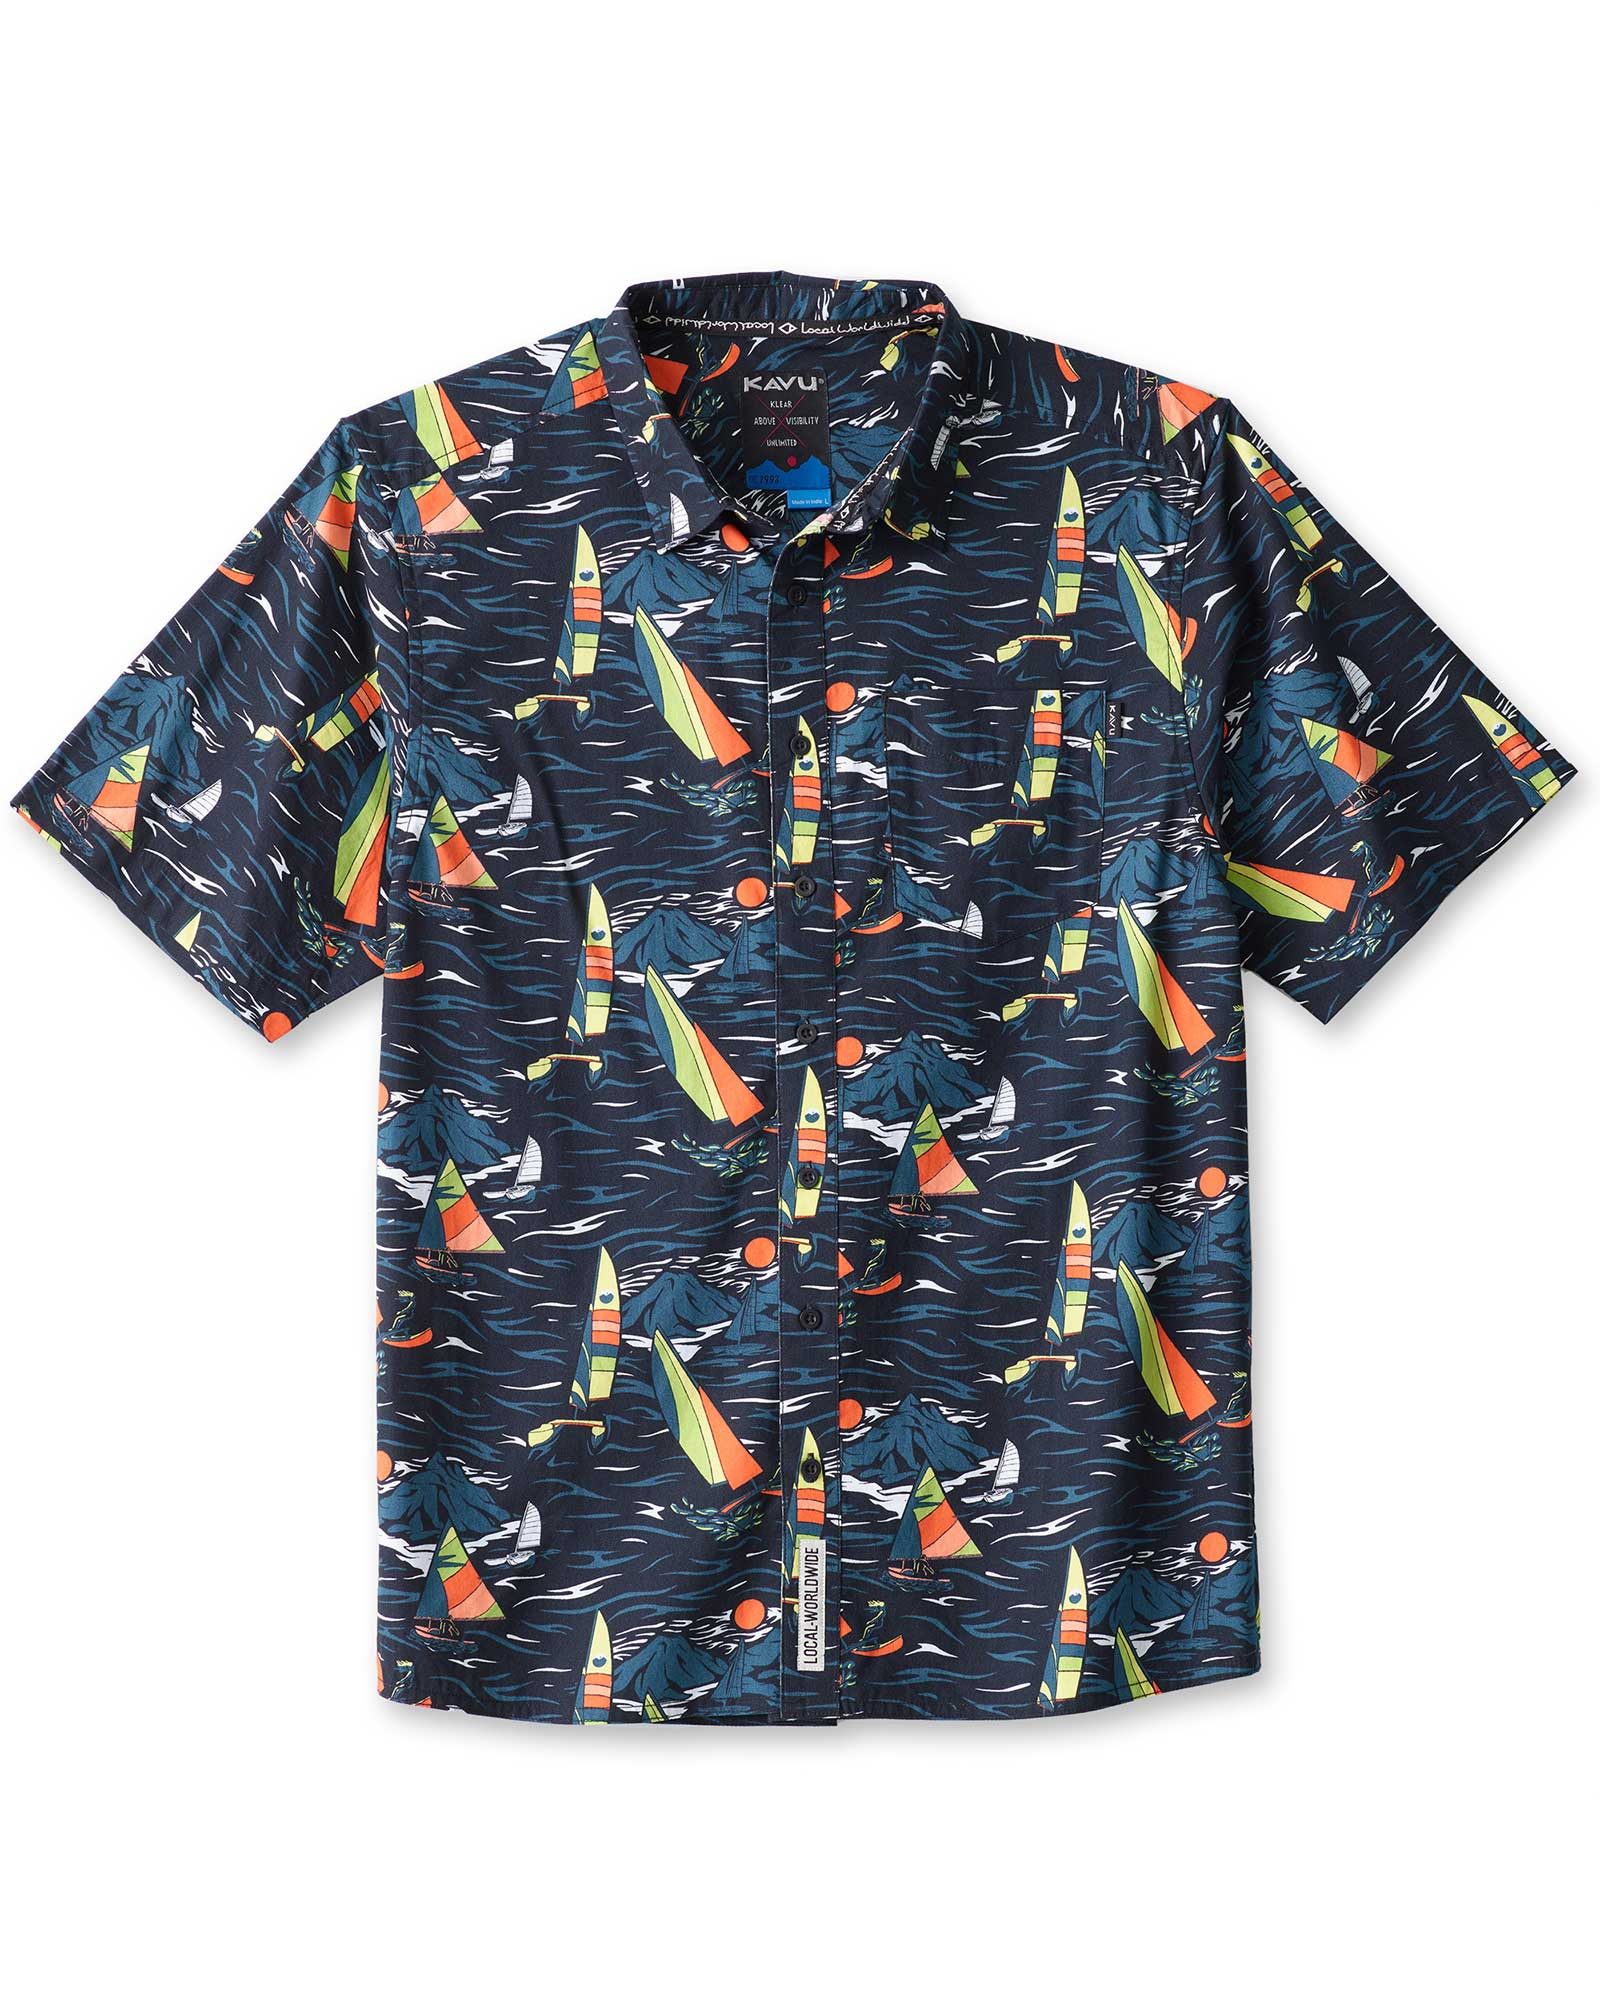 KAVU Men's Festaruski Shirt 0